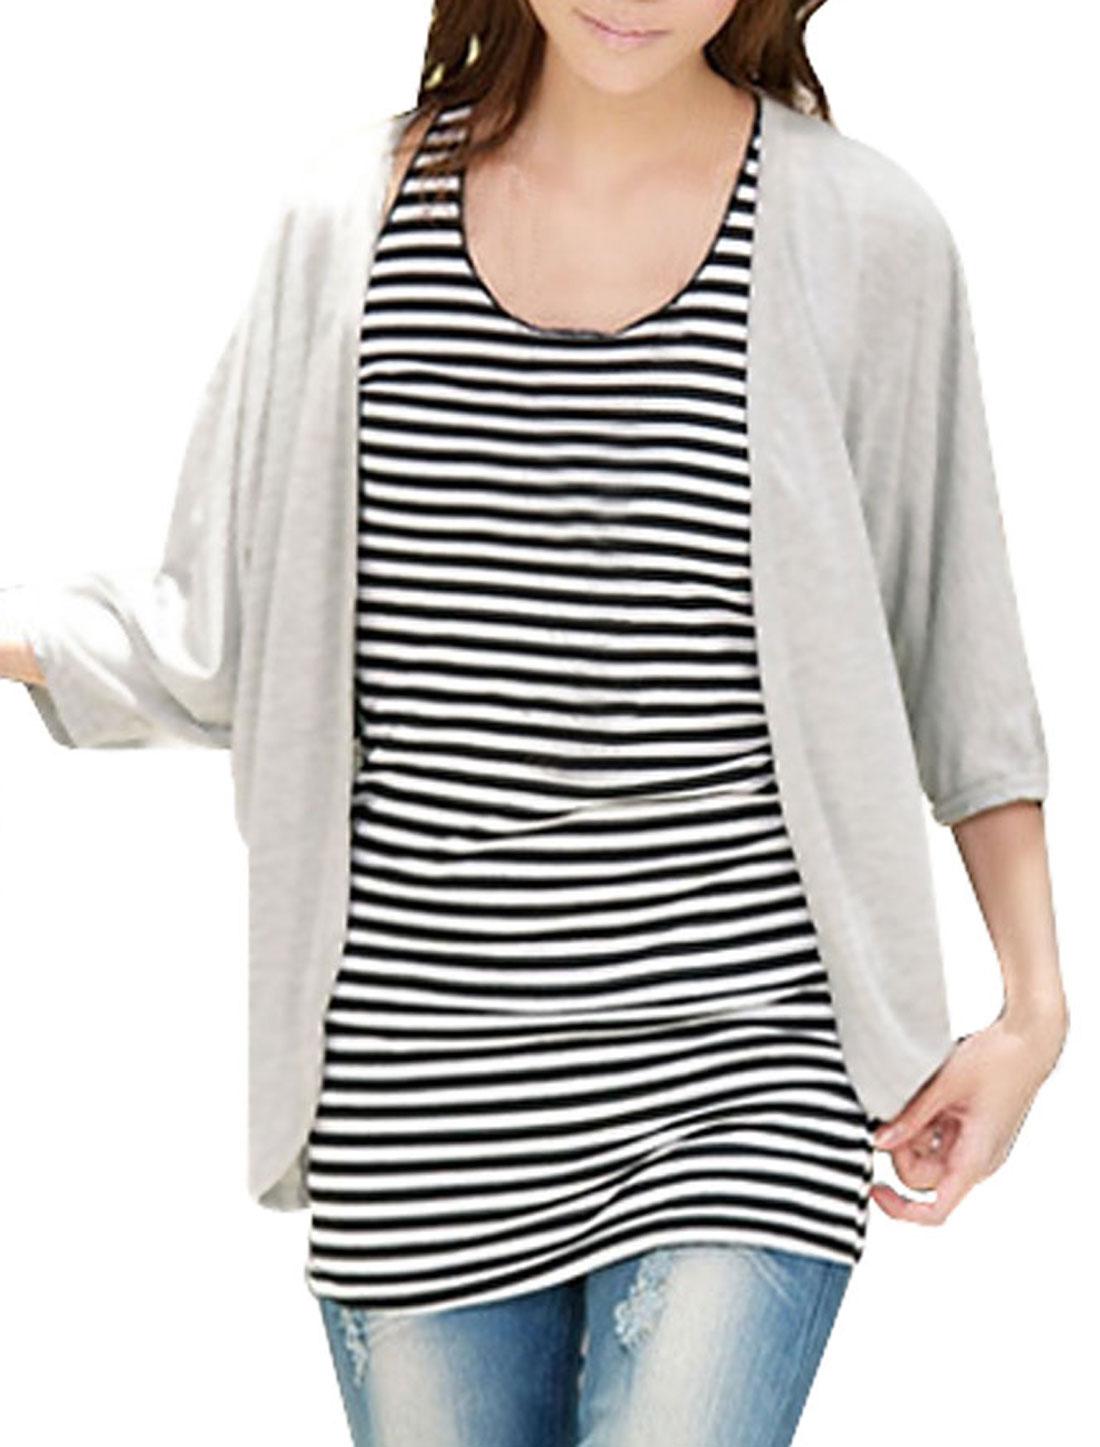 Women Gray Casual 3/4 Sleeve Cardigan w Sleeveless Pullover Stripes Shirt XS